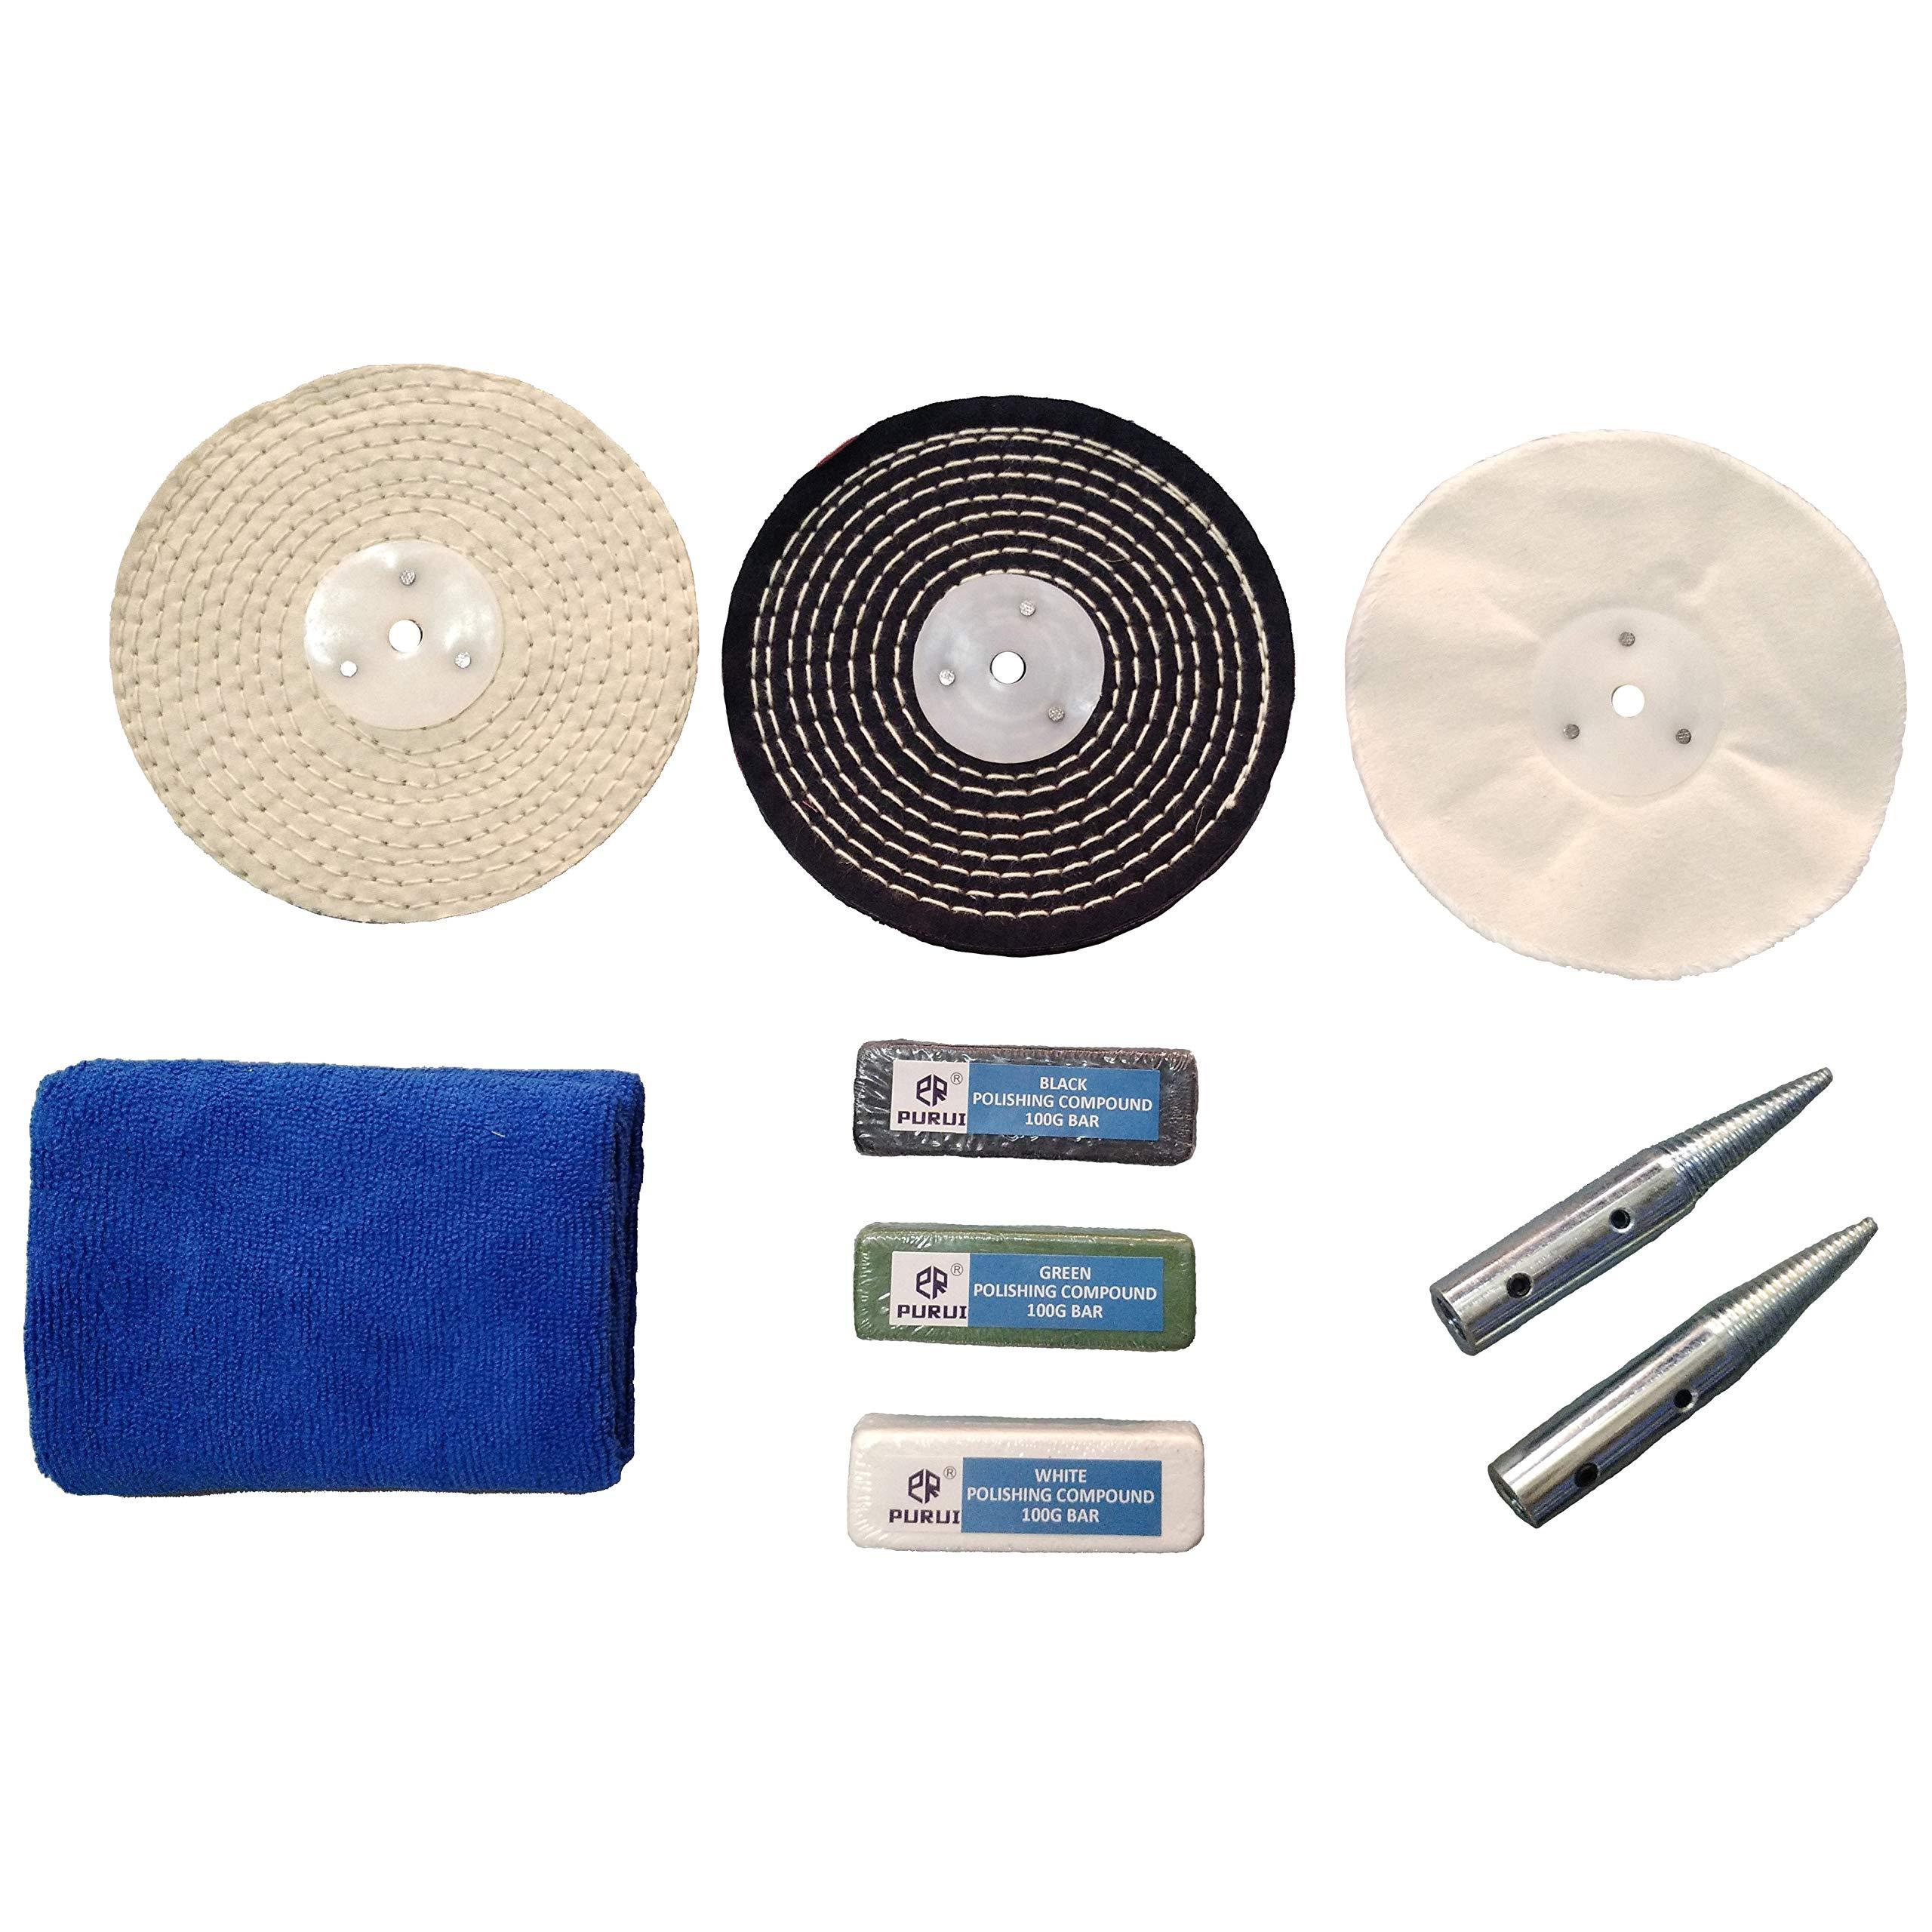 "Enkay 156-6K 6/"" Buffing /& Polishing Kit For Buffers /& Grinders"